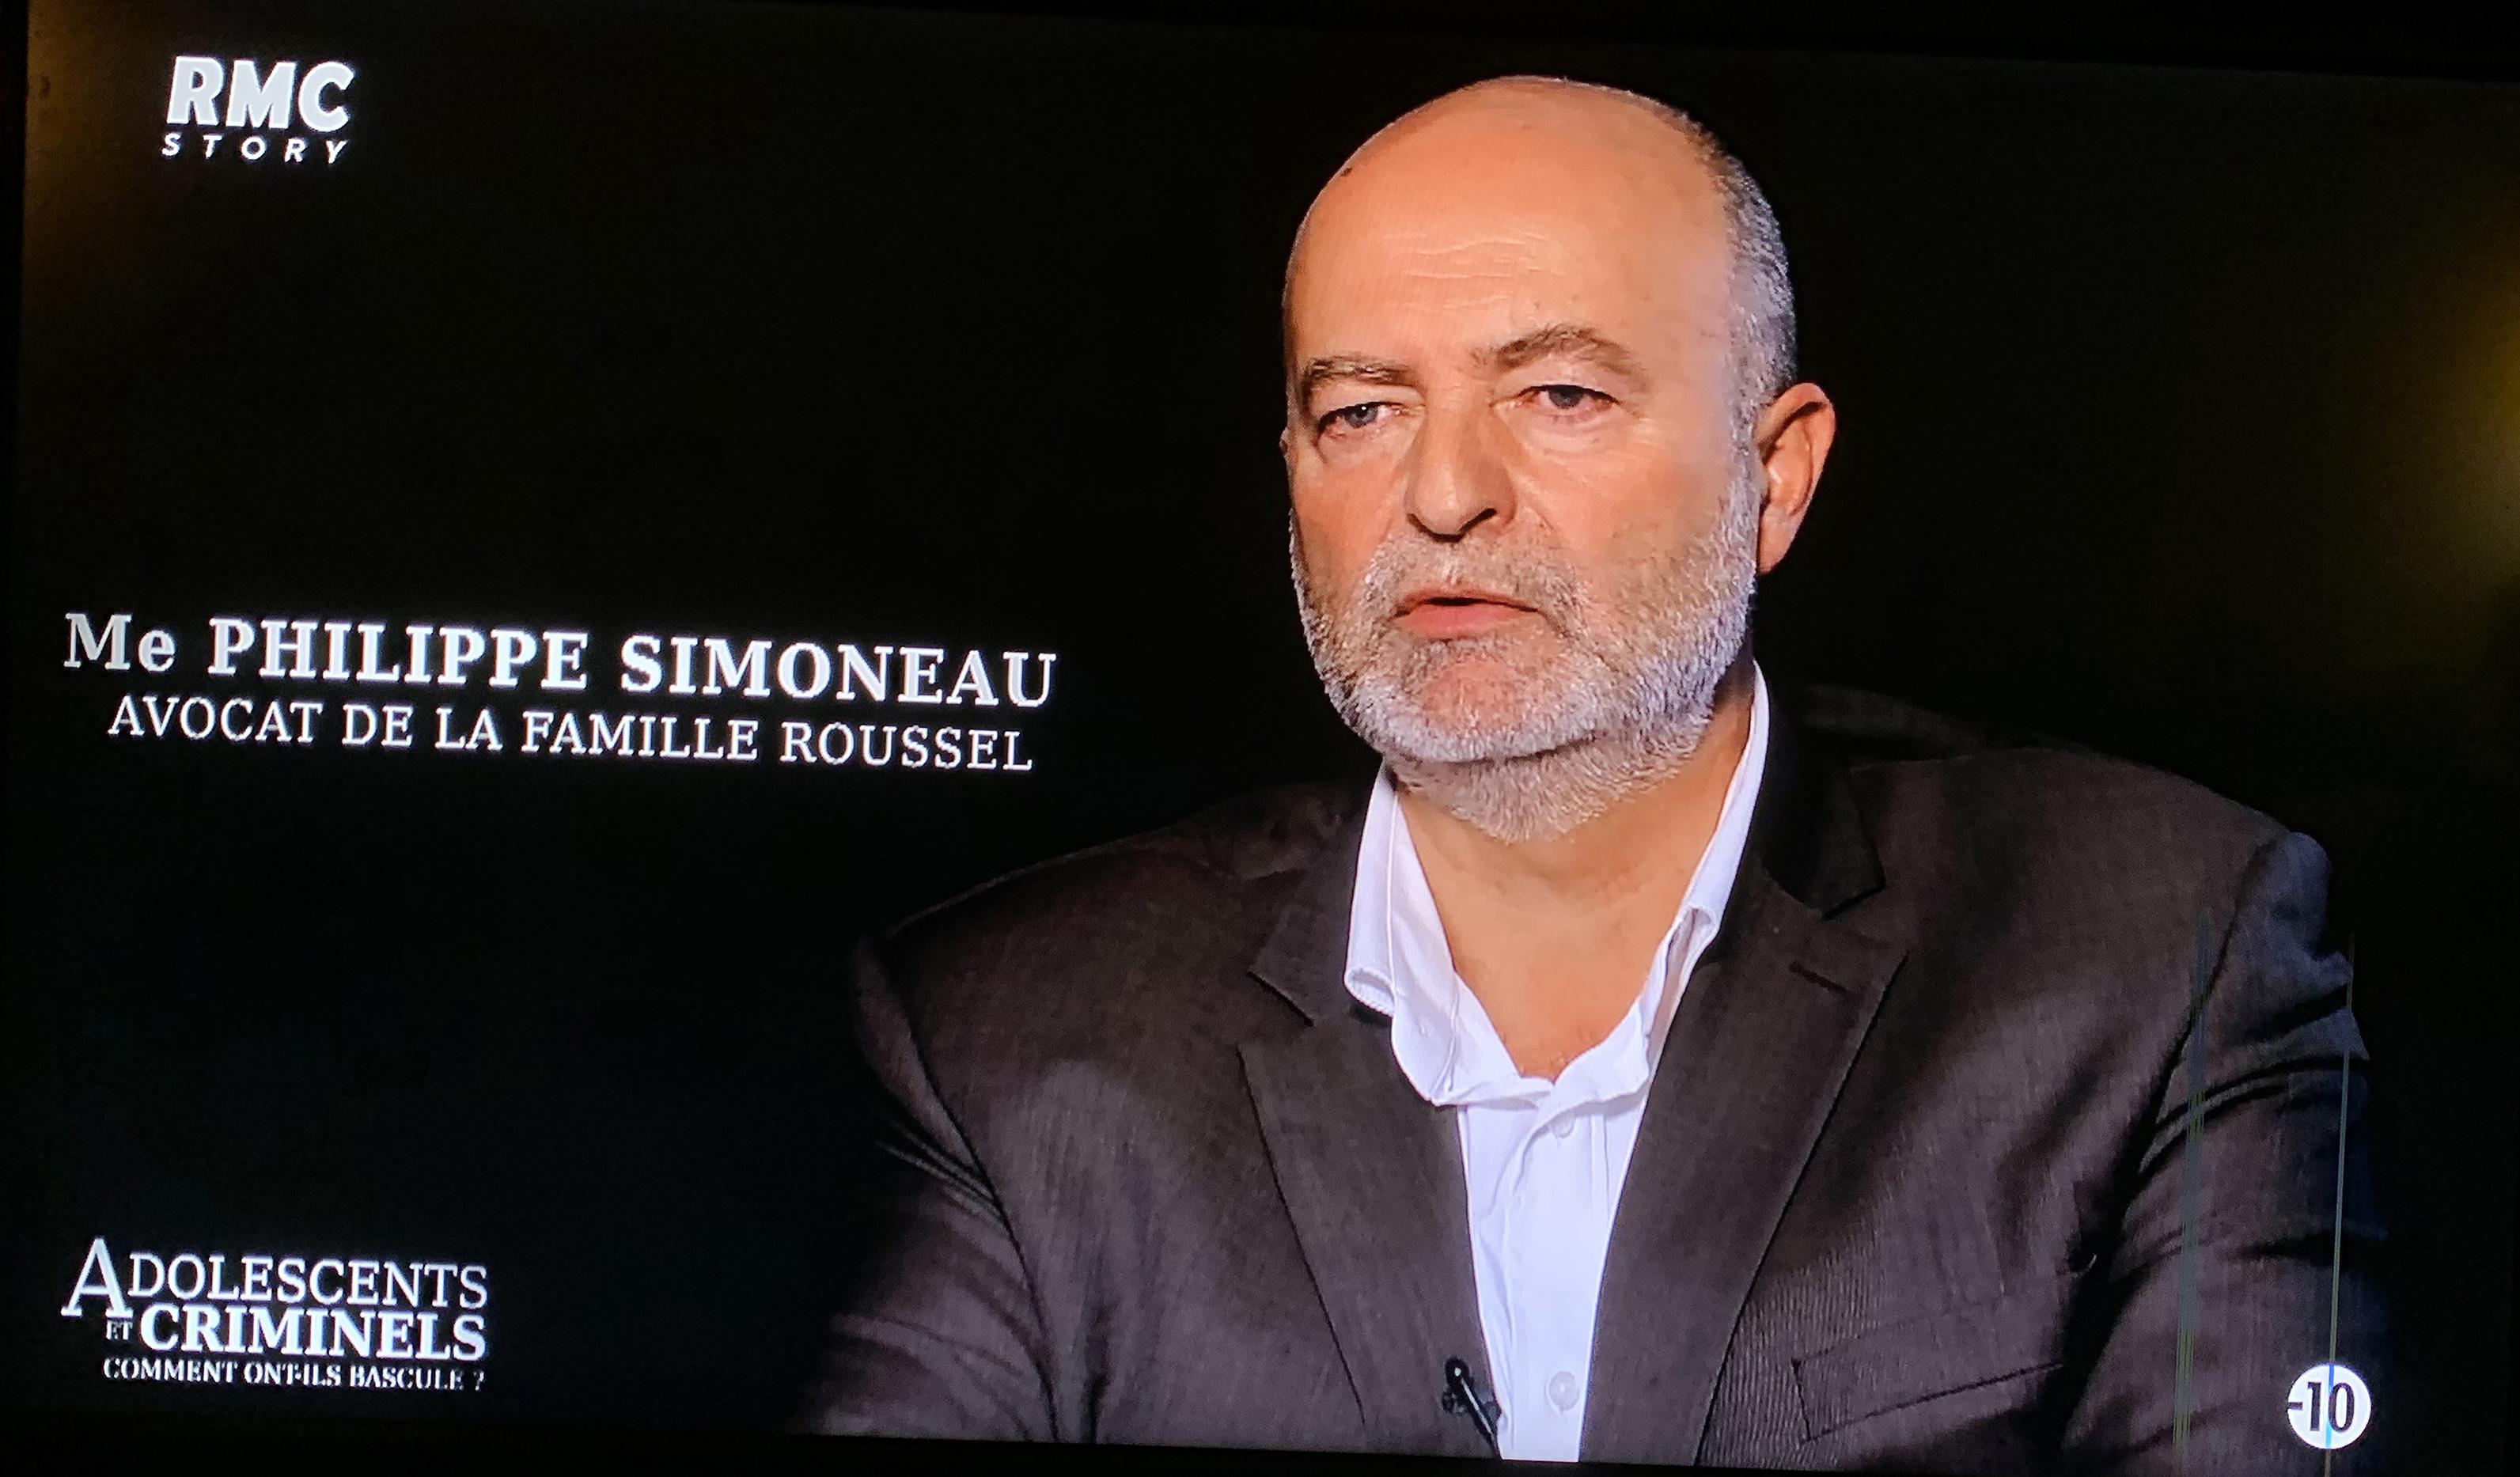 Philippe Simoneau, Maxime Roussel, RMC Story